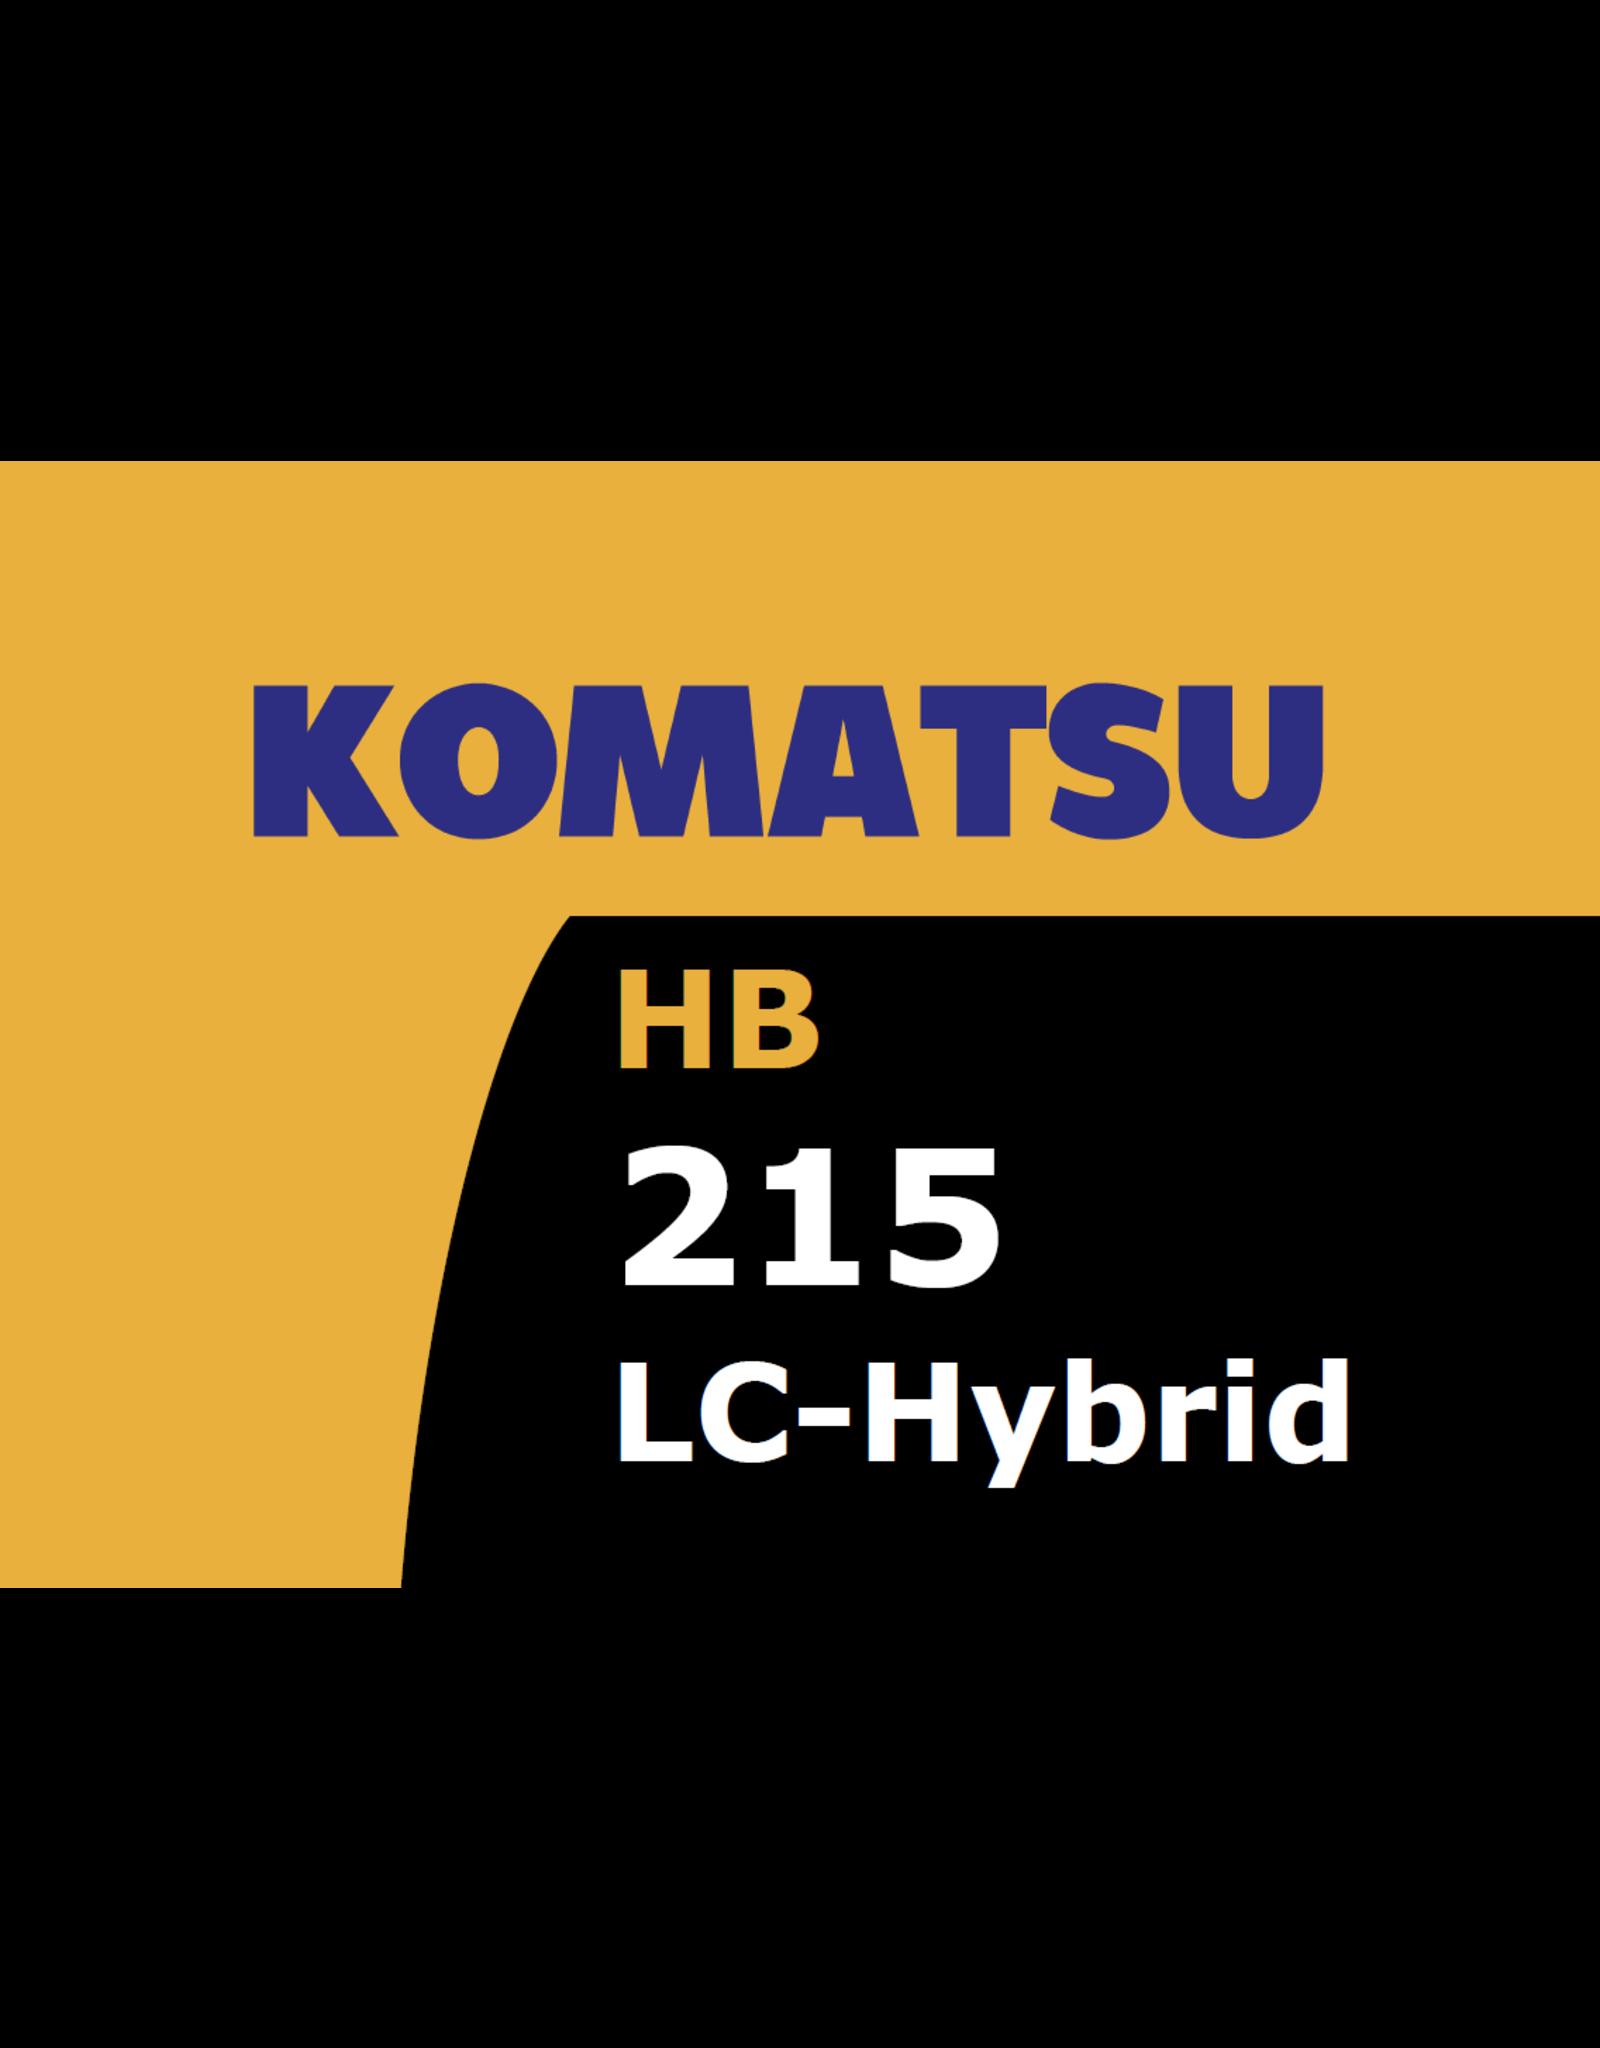 Echle Hartstahl GmbH FOPS for Komatsu HB215LC-3 Hybrid